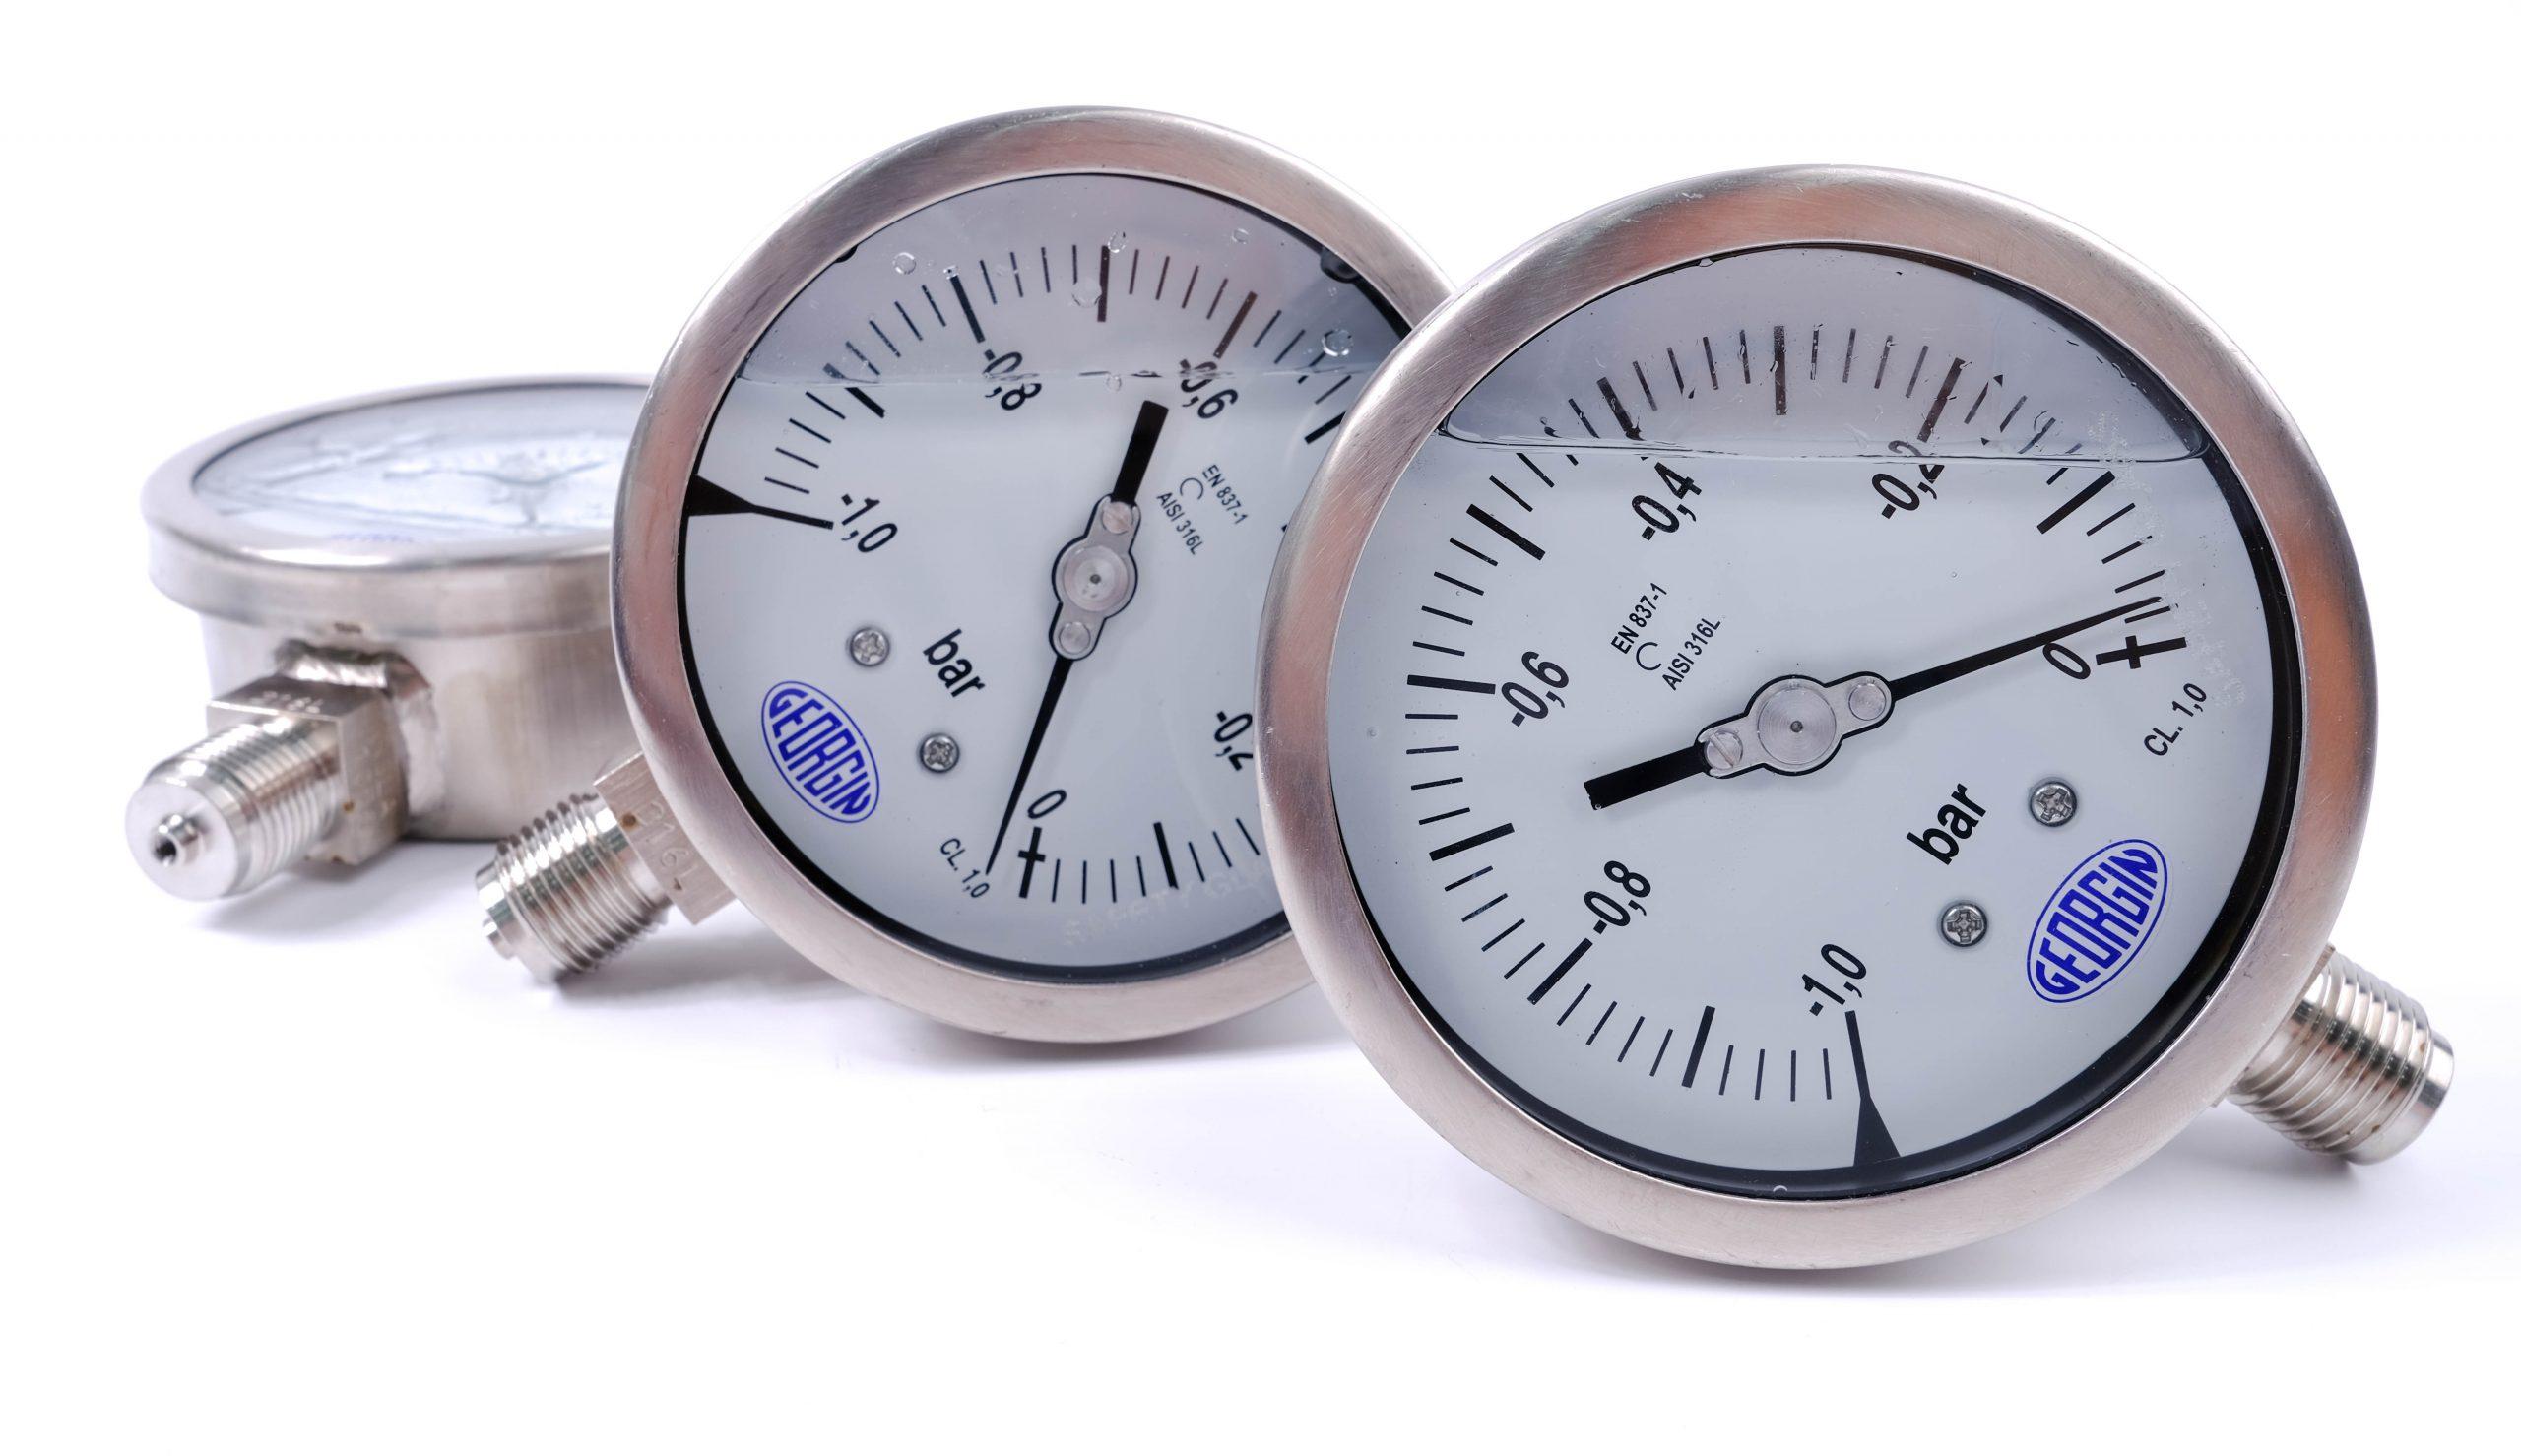 Đồng hồ đo áp suất Vaccum -1...0 bar